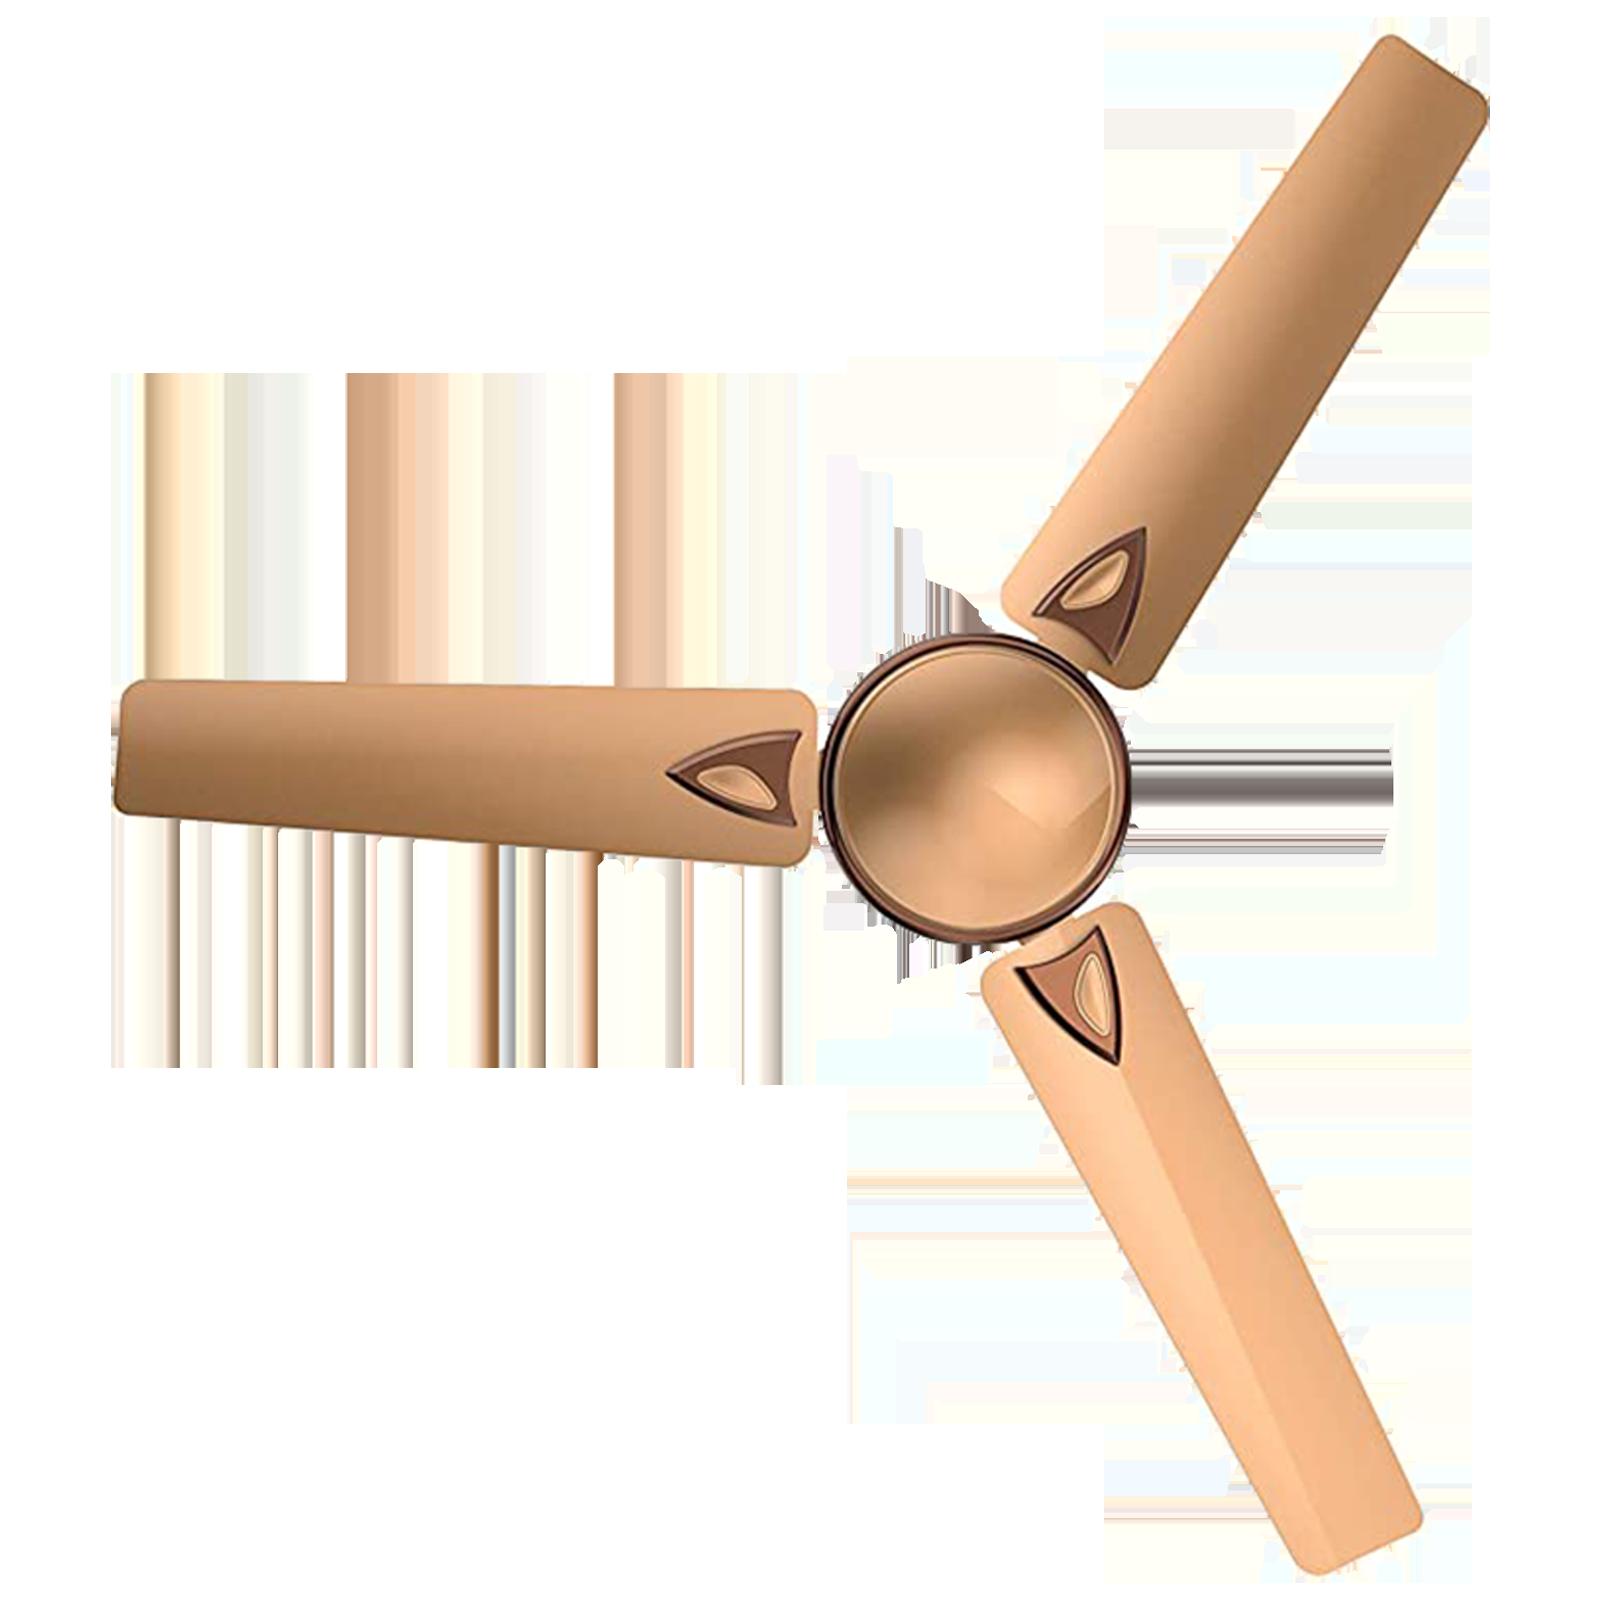 GM Nexa 120 cm Sweep 3 Blade Ceiling Fan (Aerodynamically Designed Blades, CFE480010RGMC, Gold)_1